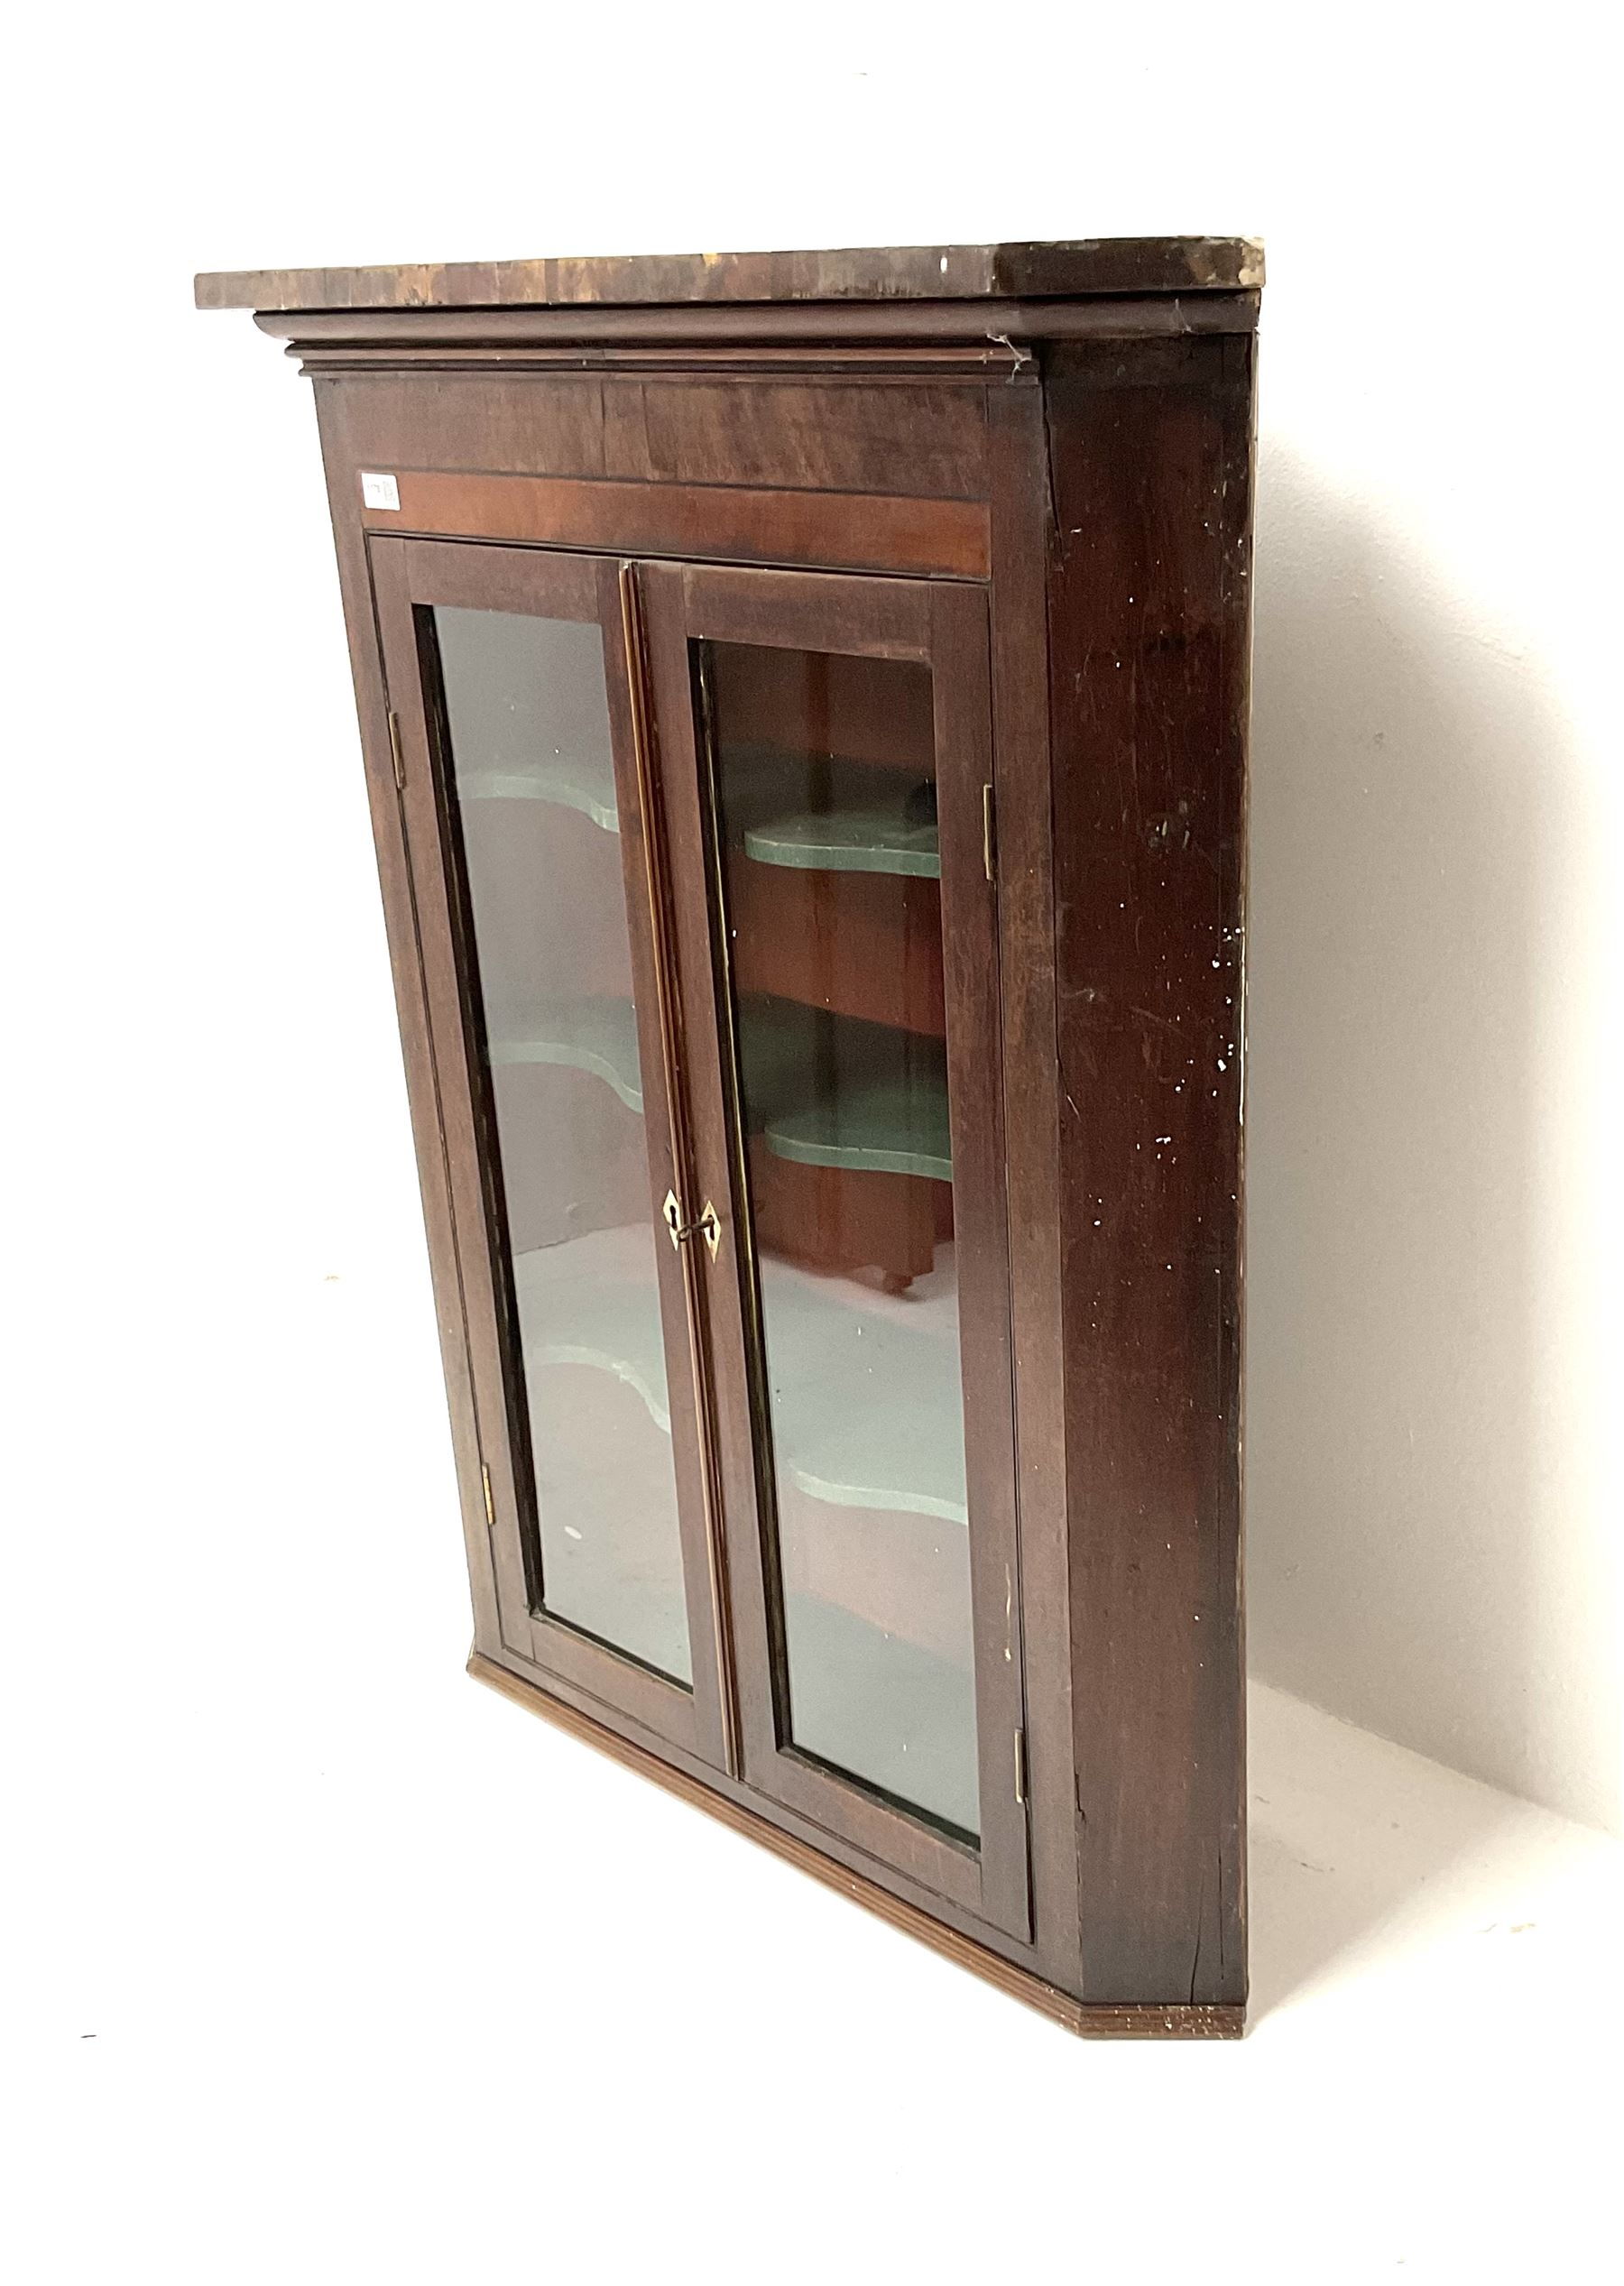 19th century mahogany hanging corner cabinet - Image 3 of 3